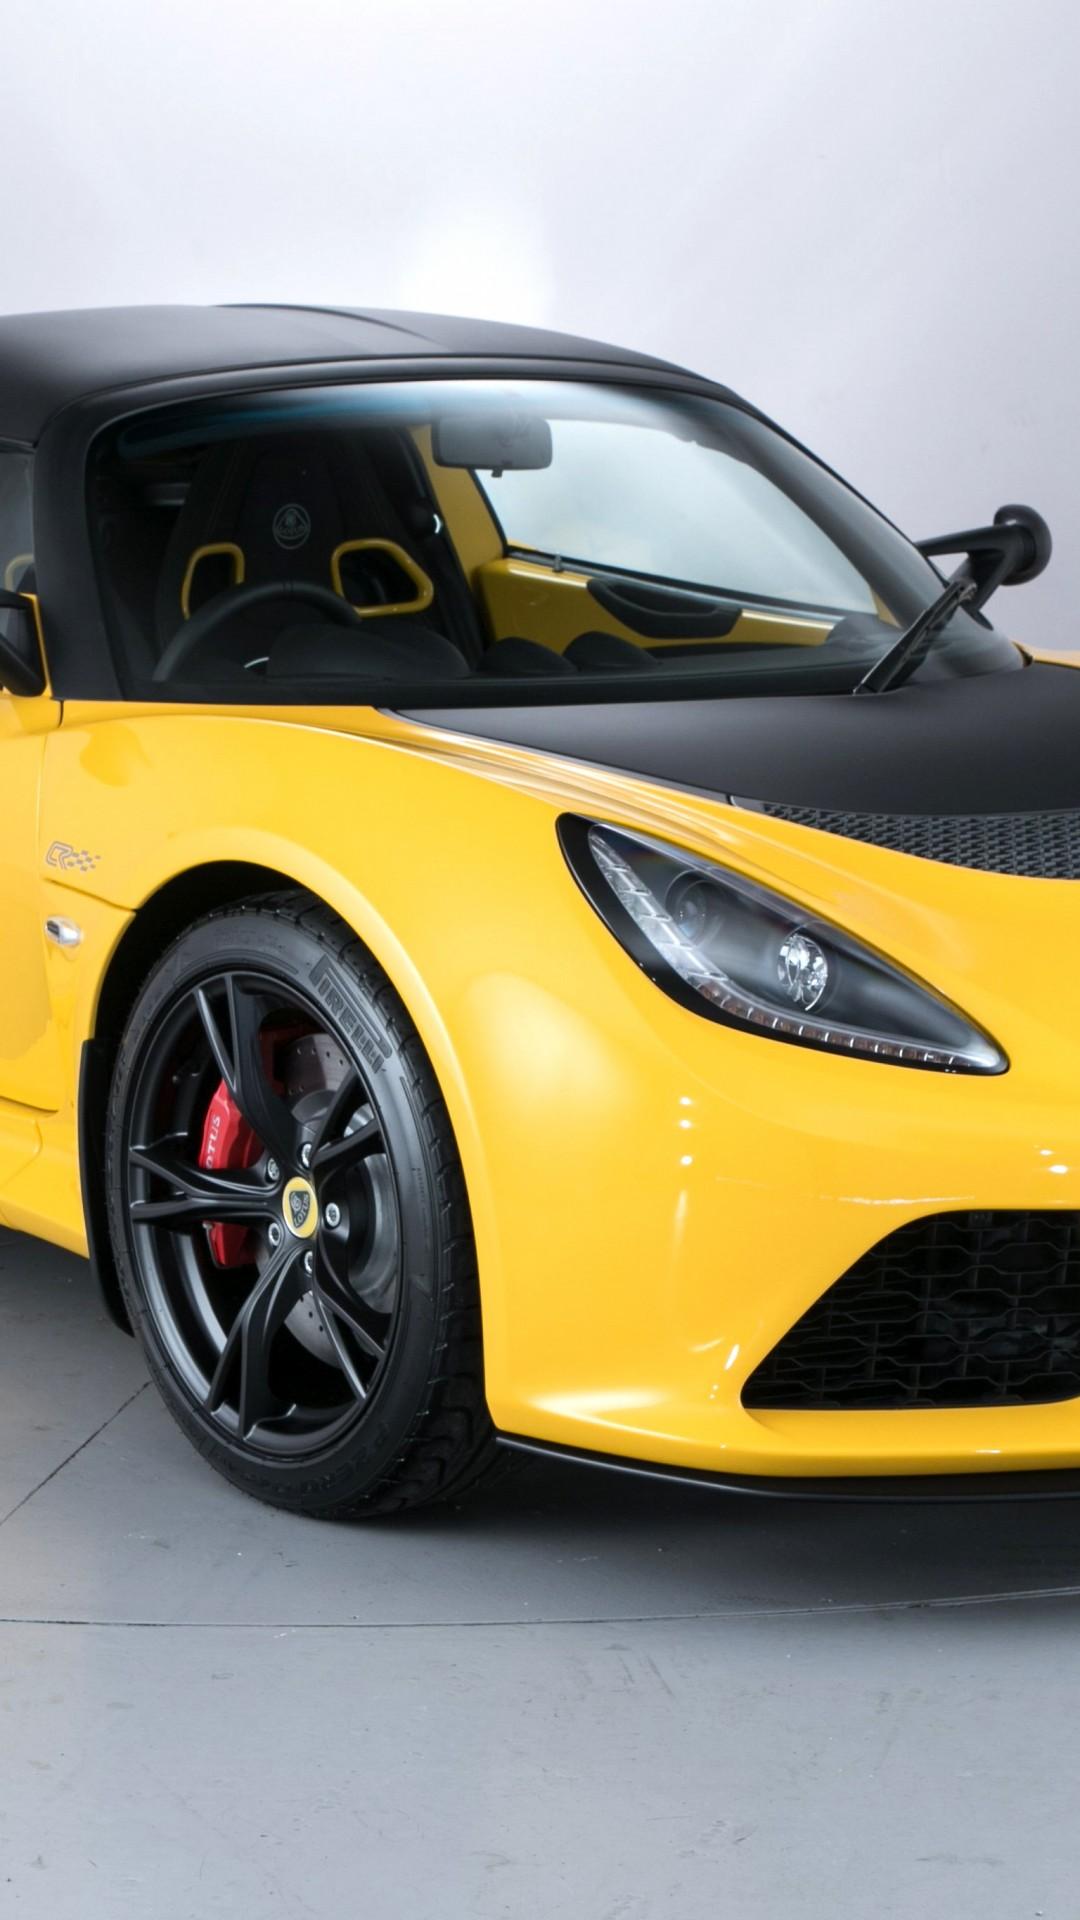 Lotus Exige S Club Racer X Supercar Yellow